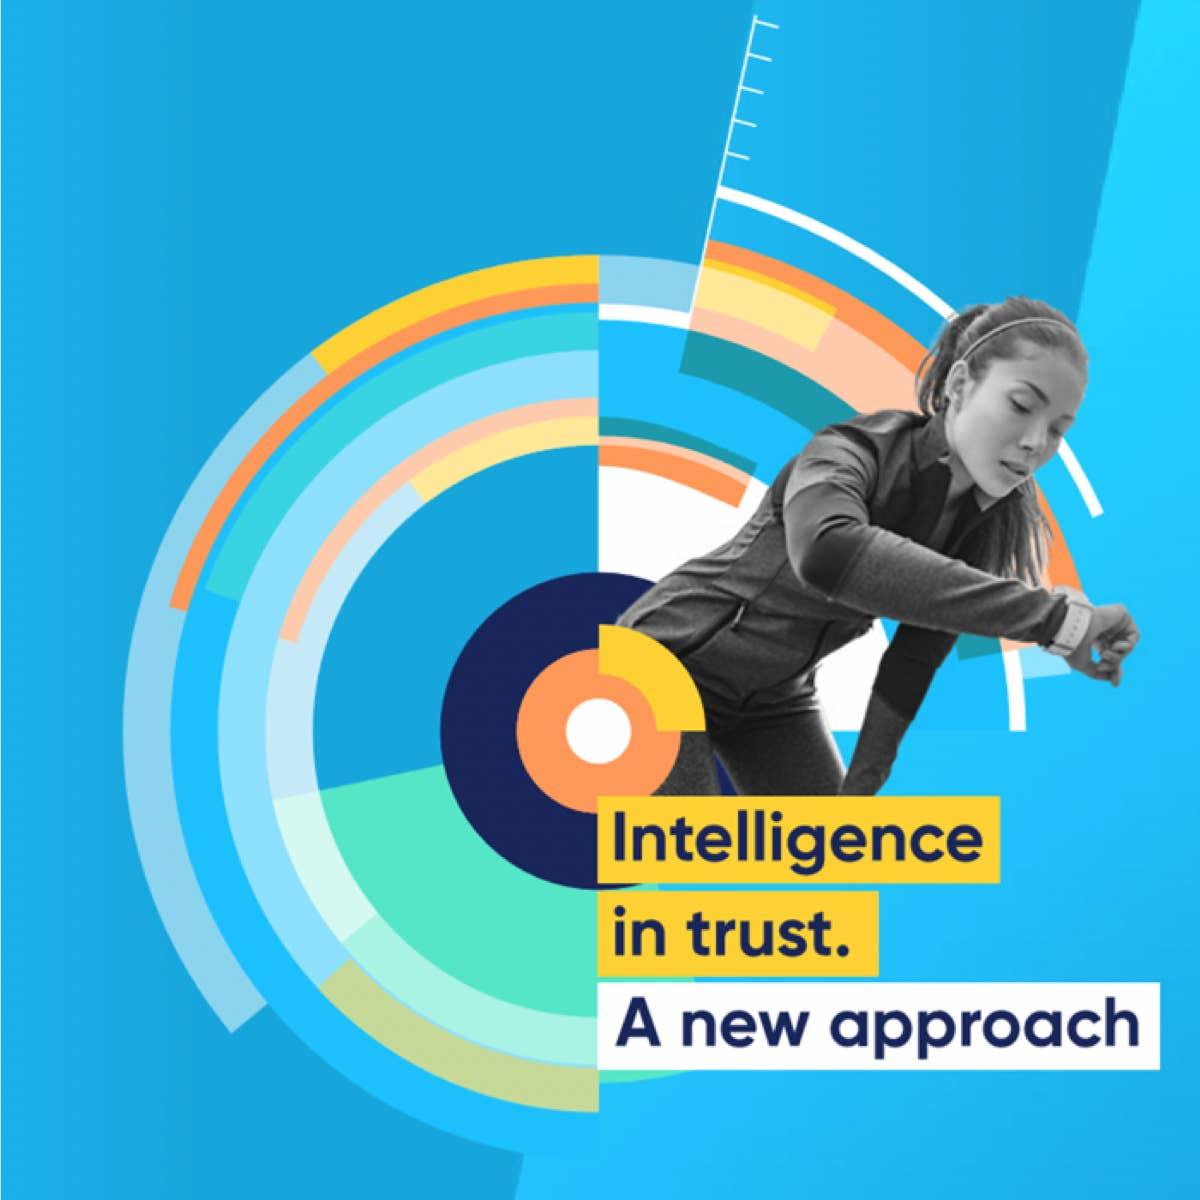 Intelligence in trust. A new approach.